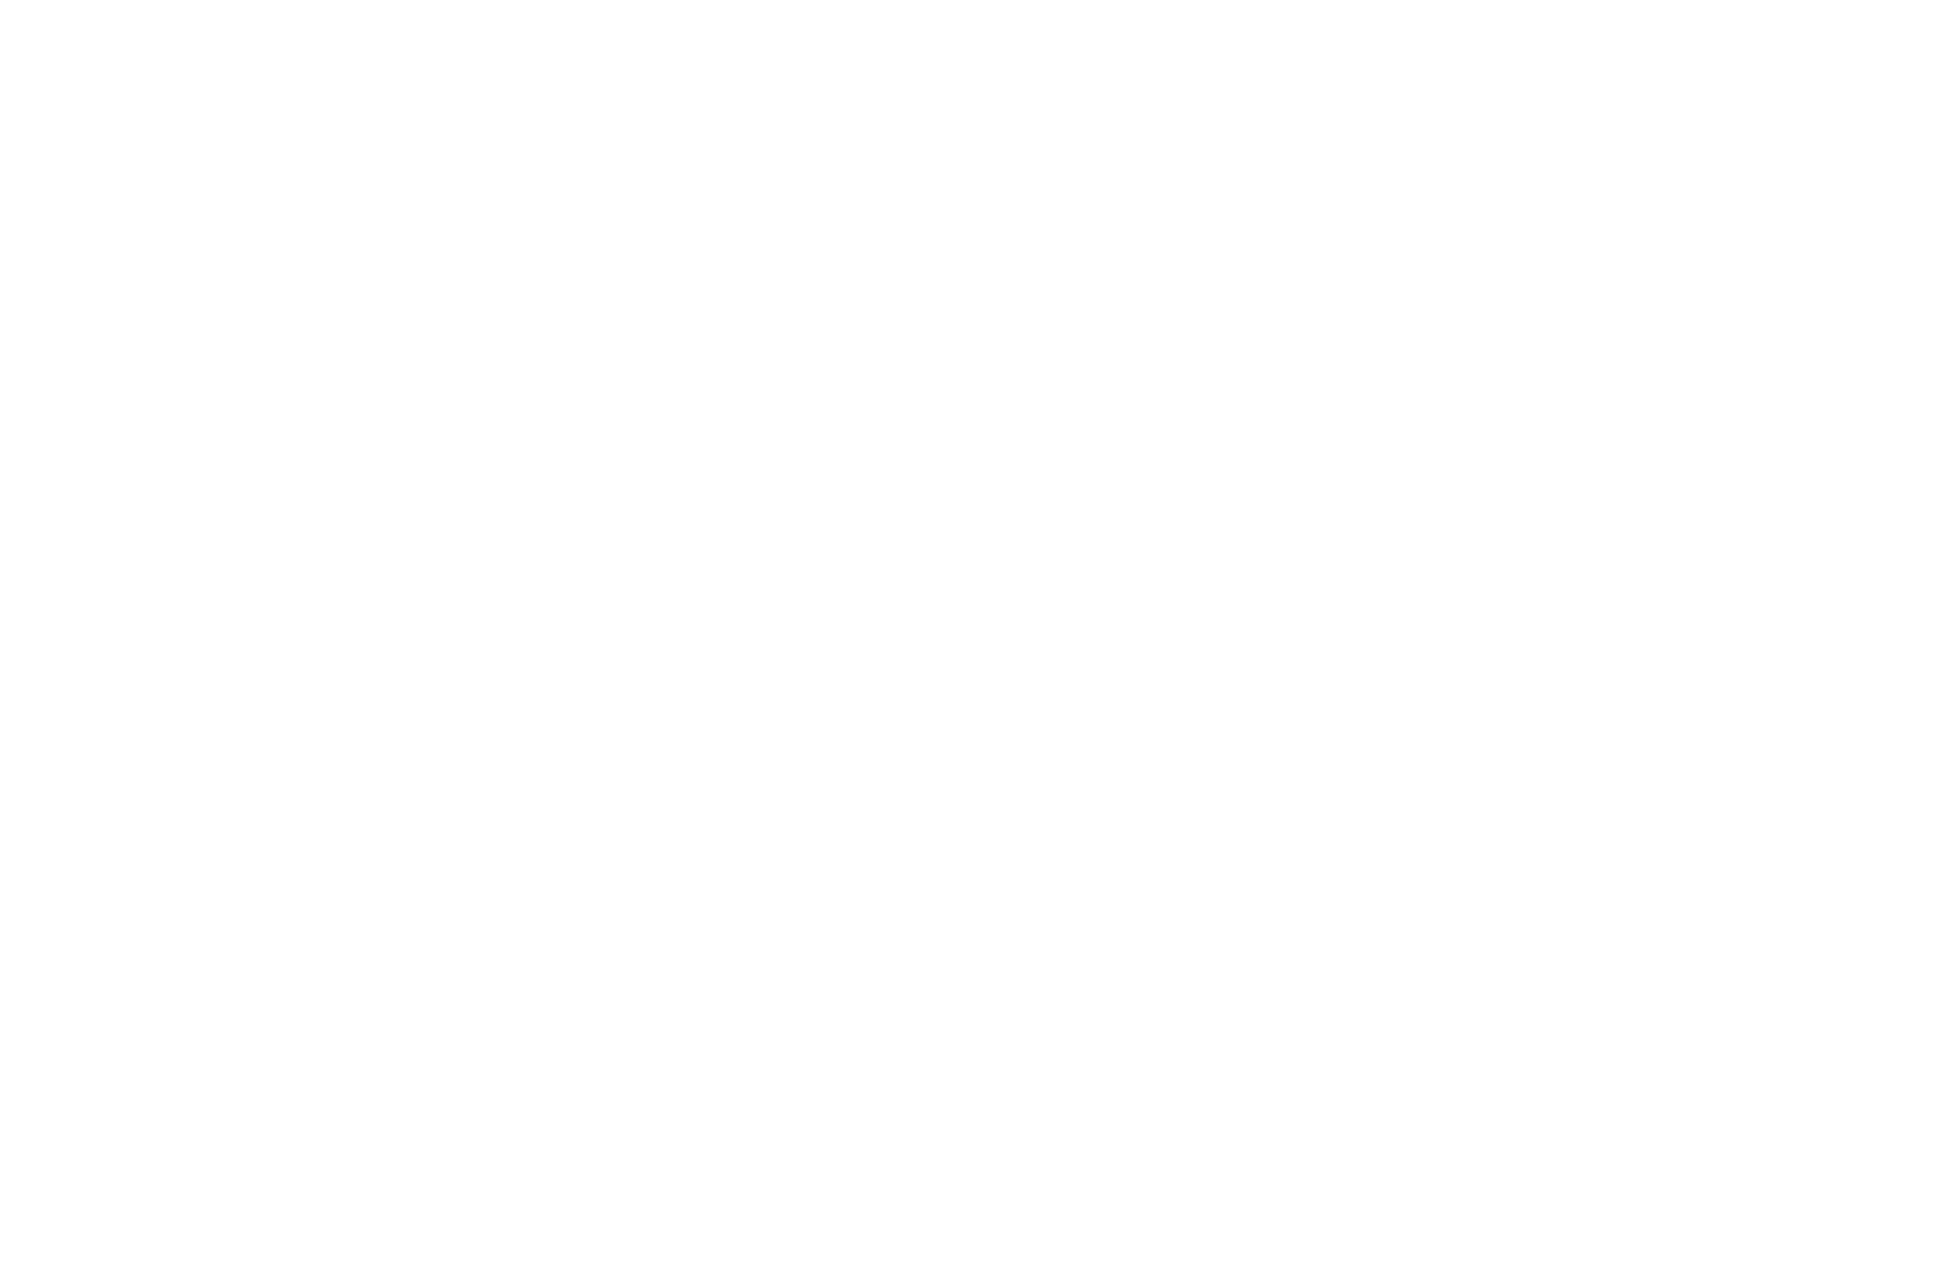 Bowery Film Festival Best Episodic Spring 2019